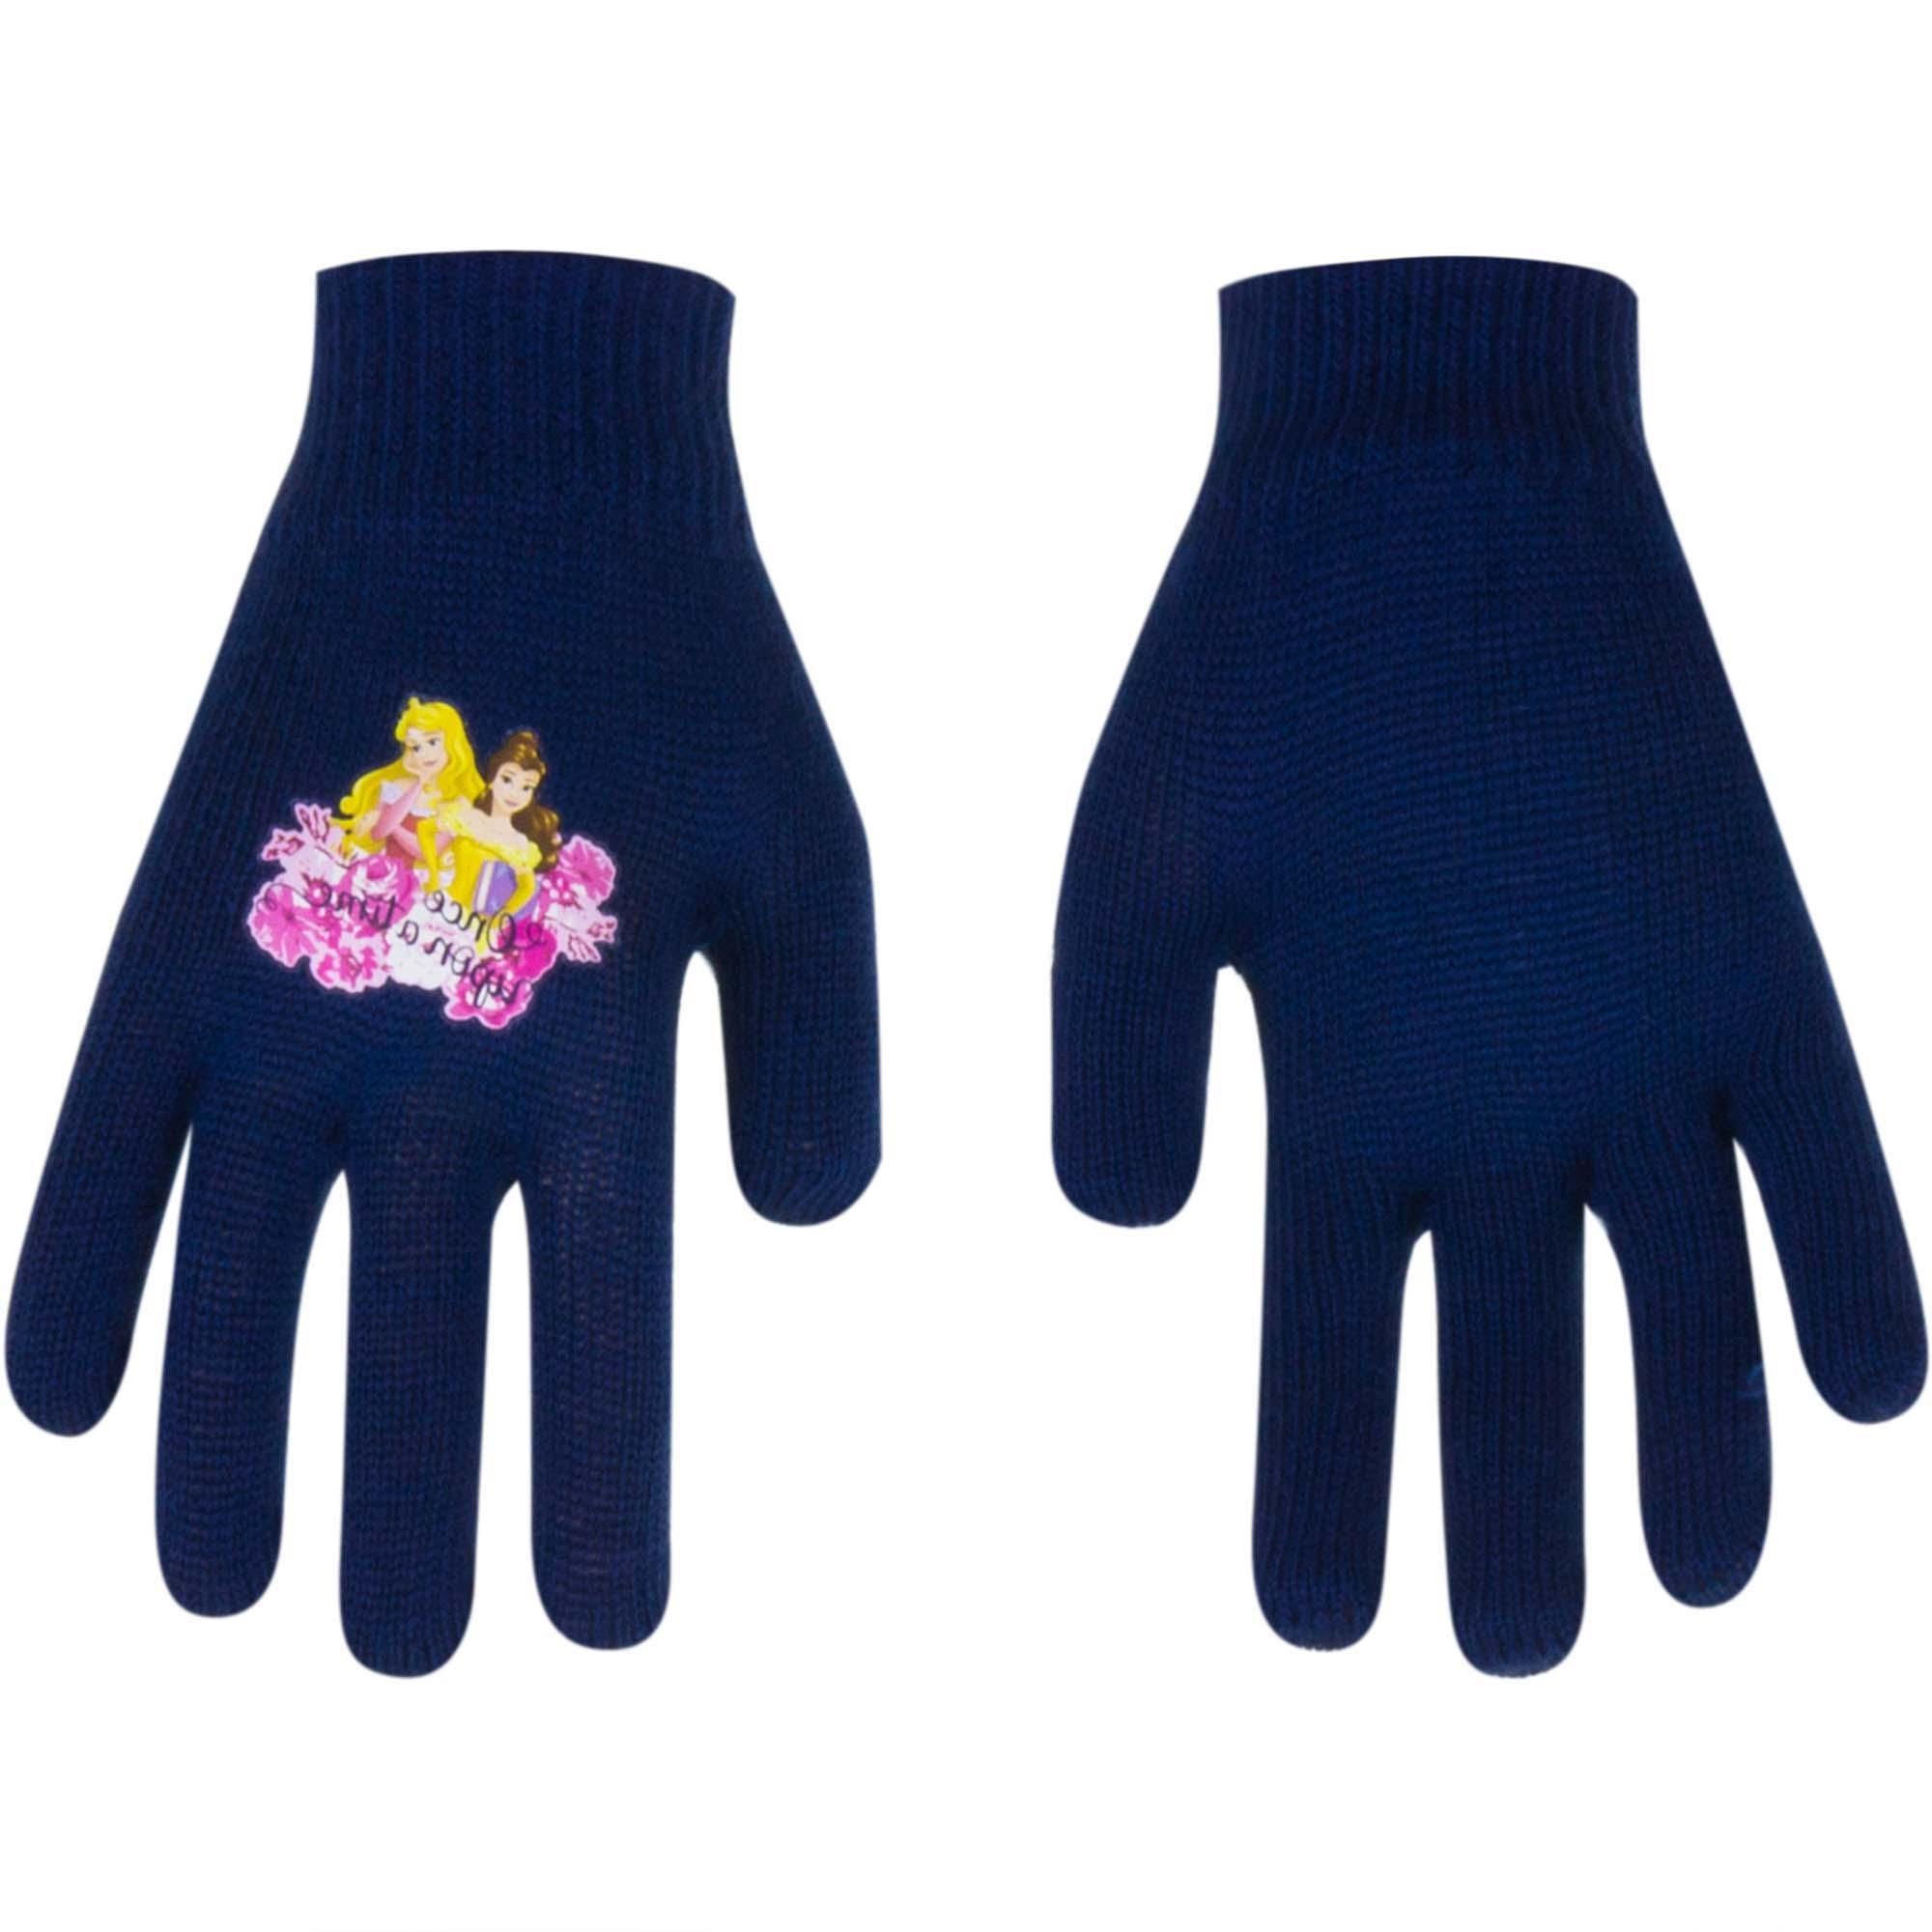 Princess gloves Magic Navy (Age: 2-5 years old)